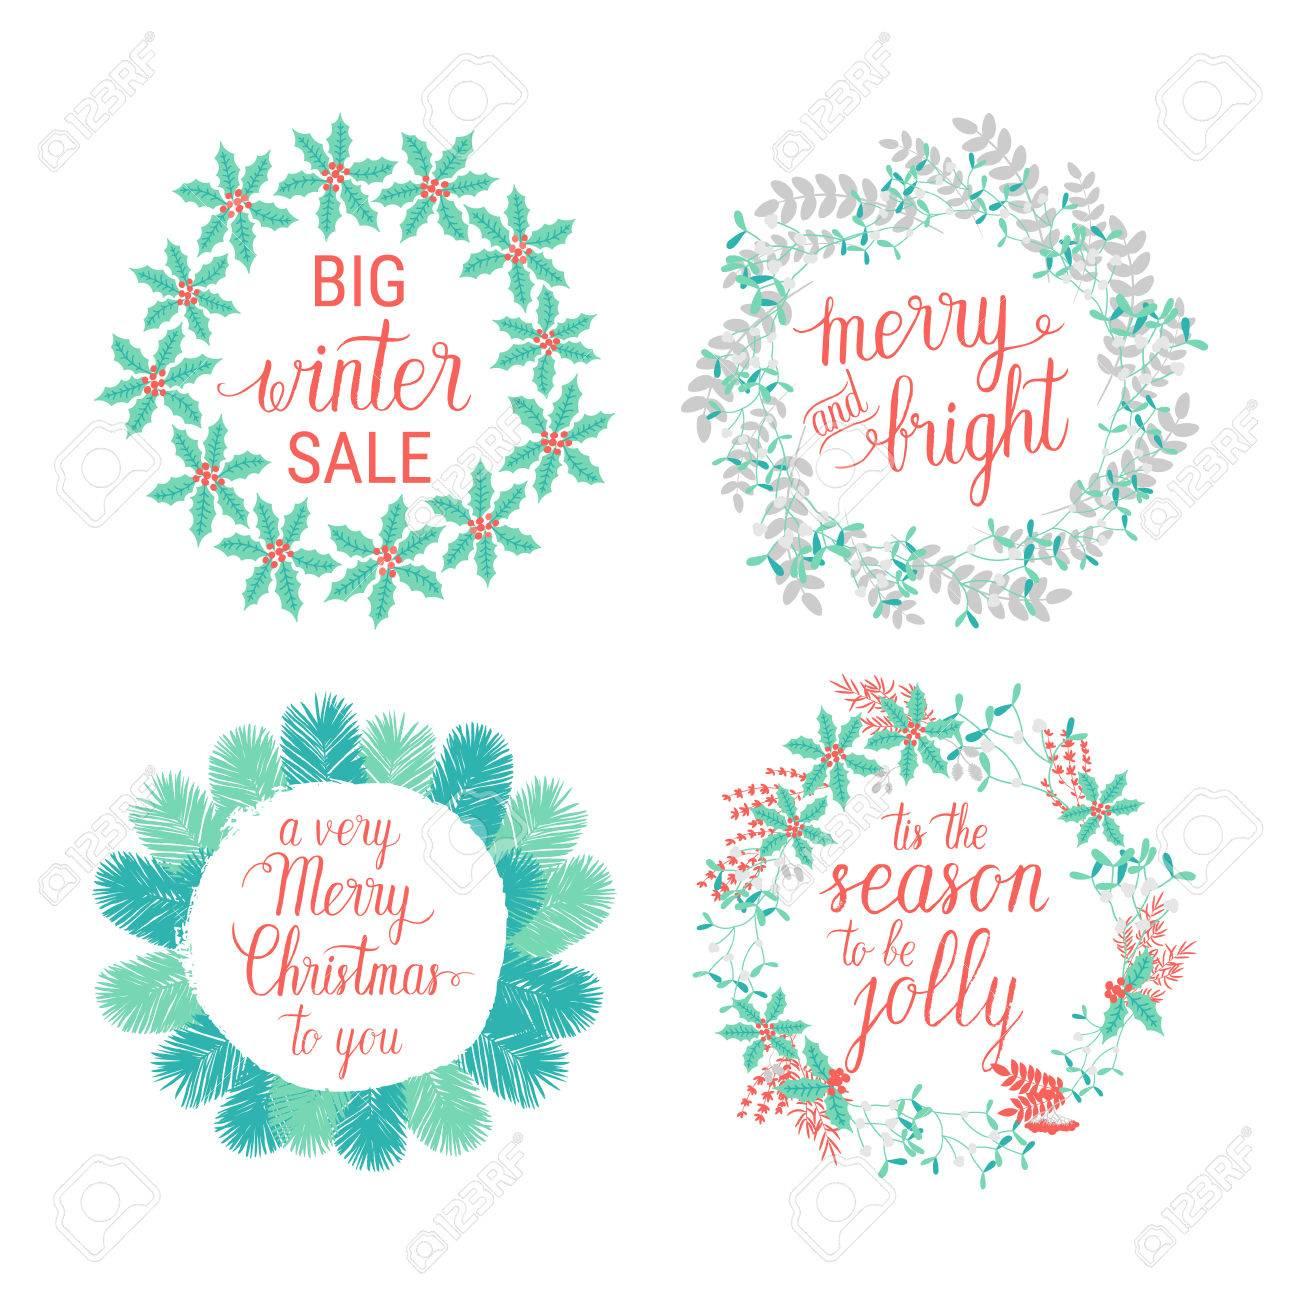 Merry And Bright, Happy Holidays, Happy New Year, Tis The Season ...